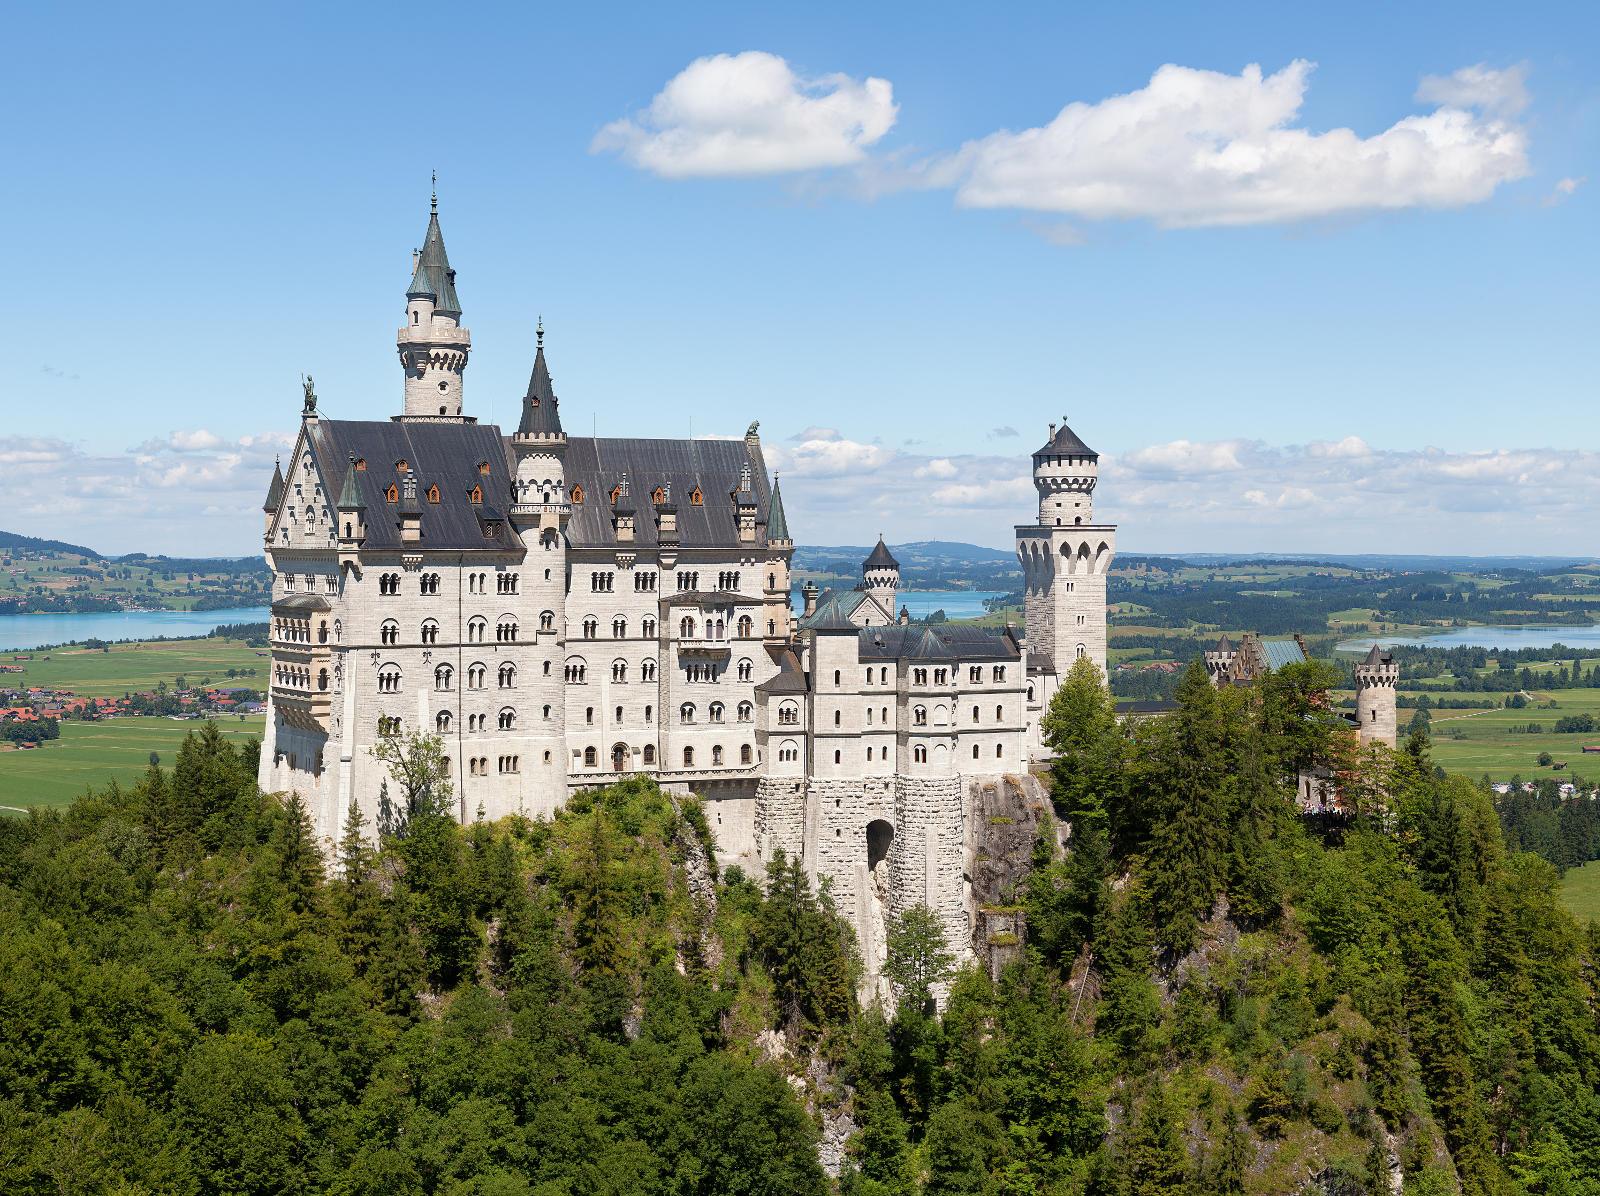 El castillo de Neuschwanstein